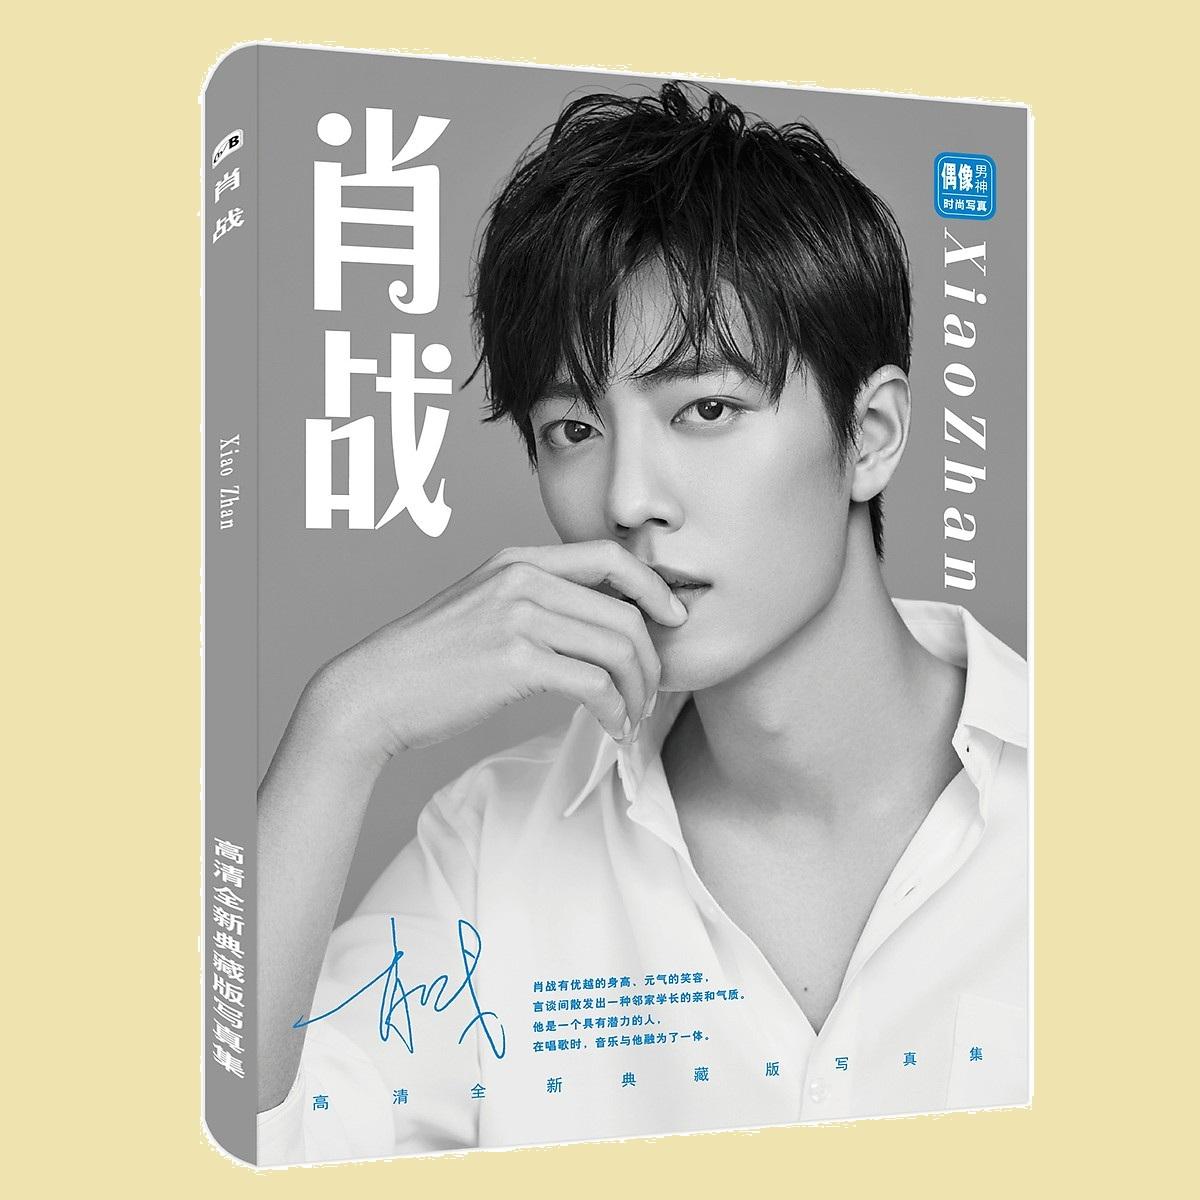 Photobook idol Tiêu Chiến cập nhật mới nhất